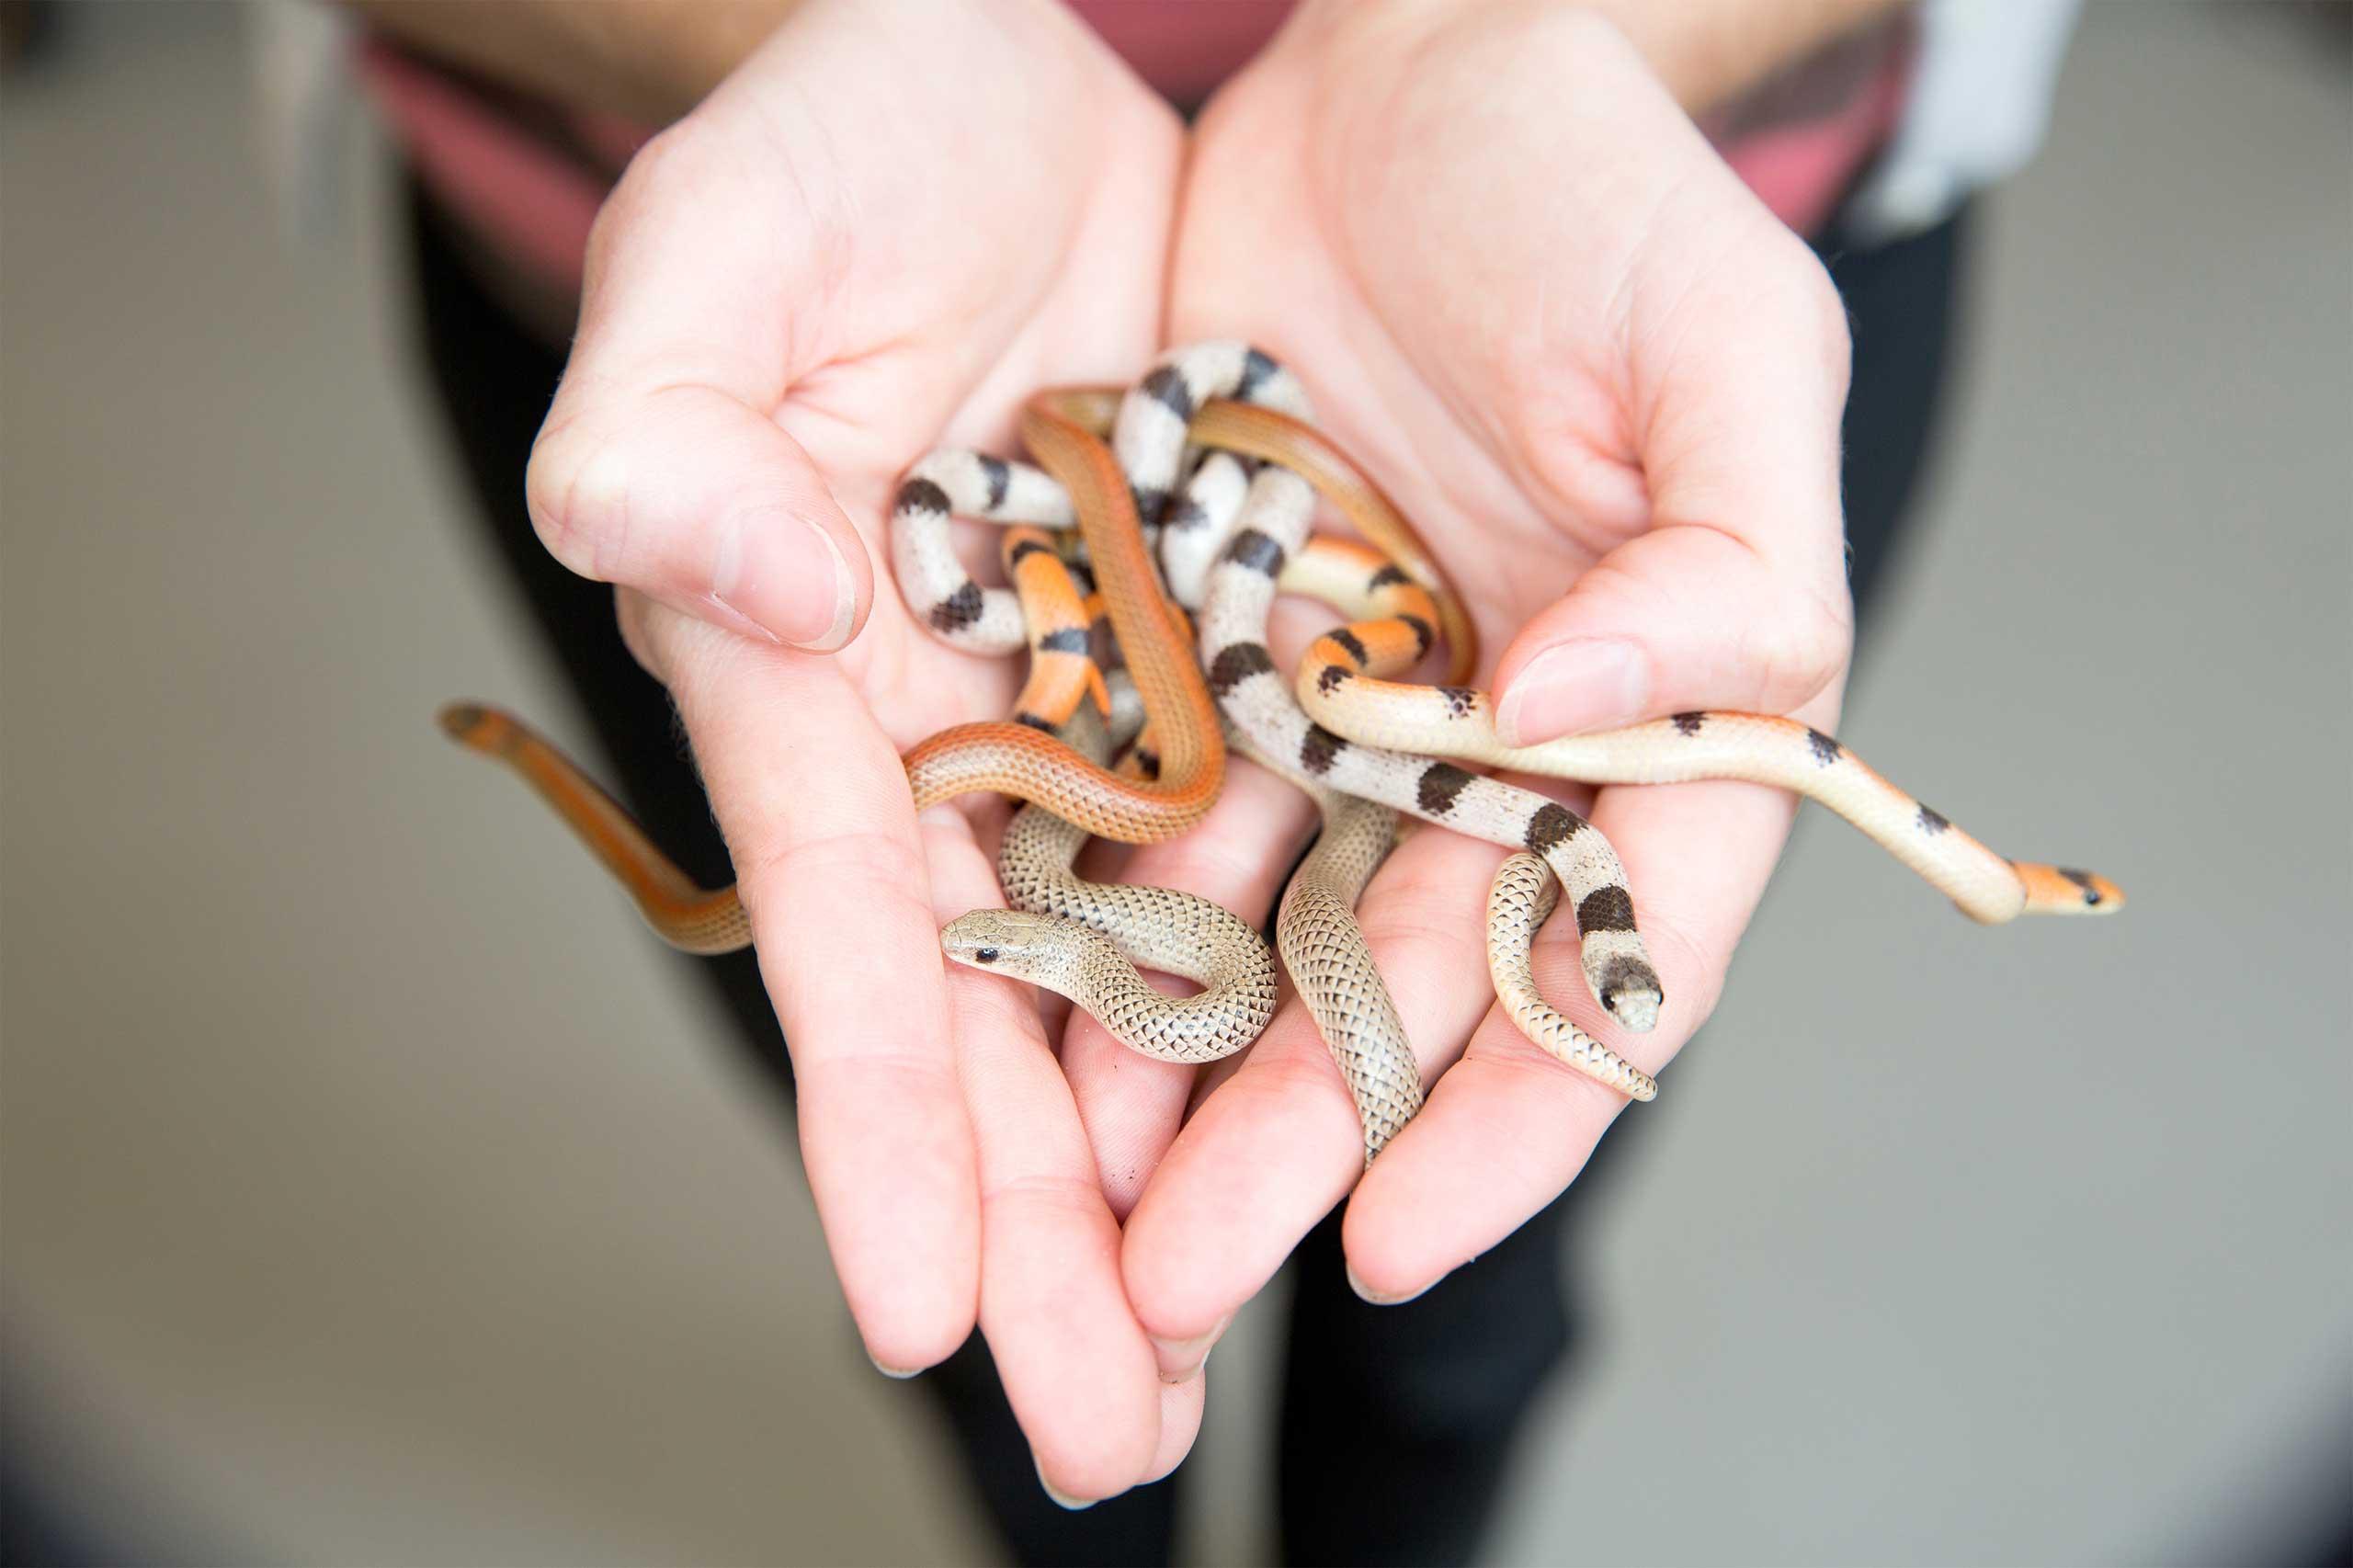 1_mimicking-venomous-snakes-orig-20130625